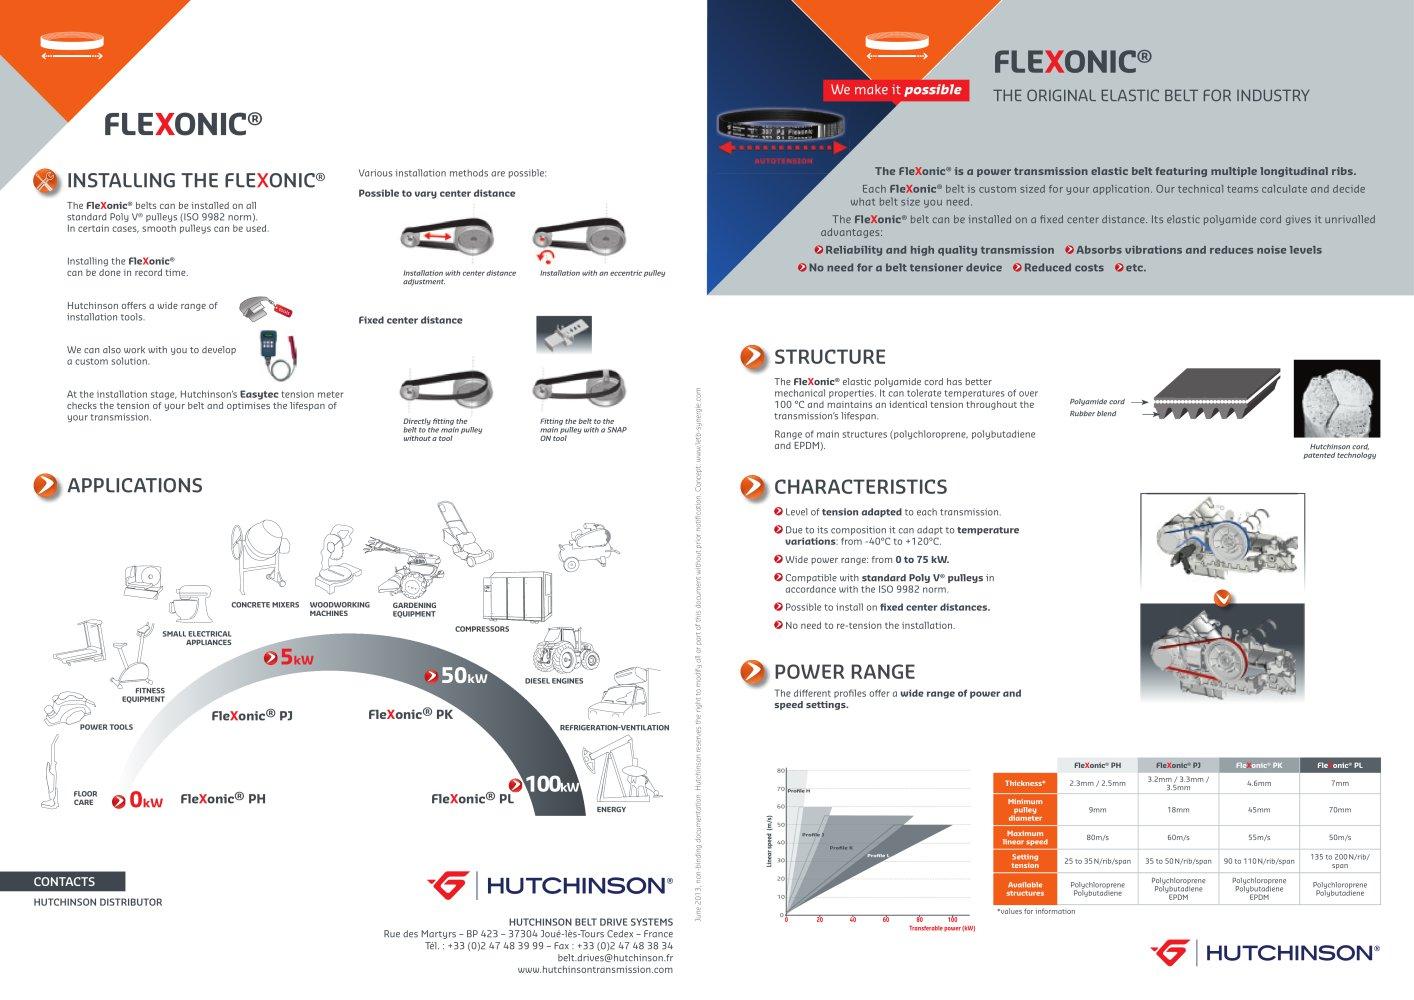 http://img.directindustry.com/pdf/repository_di/11998/hutchinson-flexonic-first-flexible-belt-industry-presentation-hutchinson-flexonic-product-its-technical-data-133360_1b.jpg